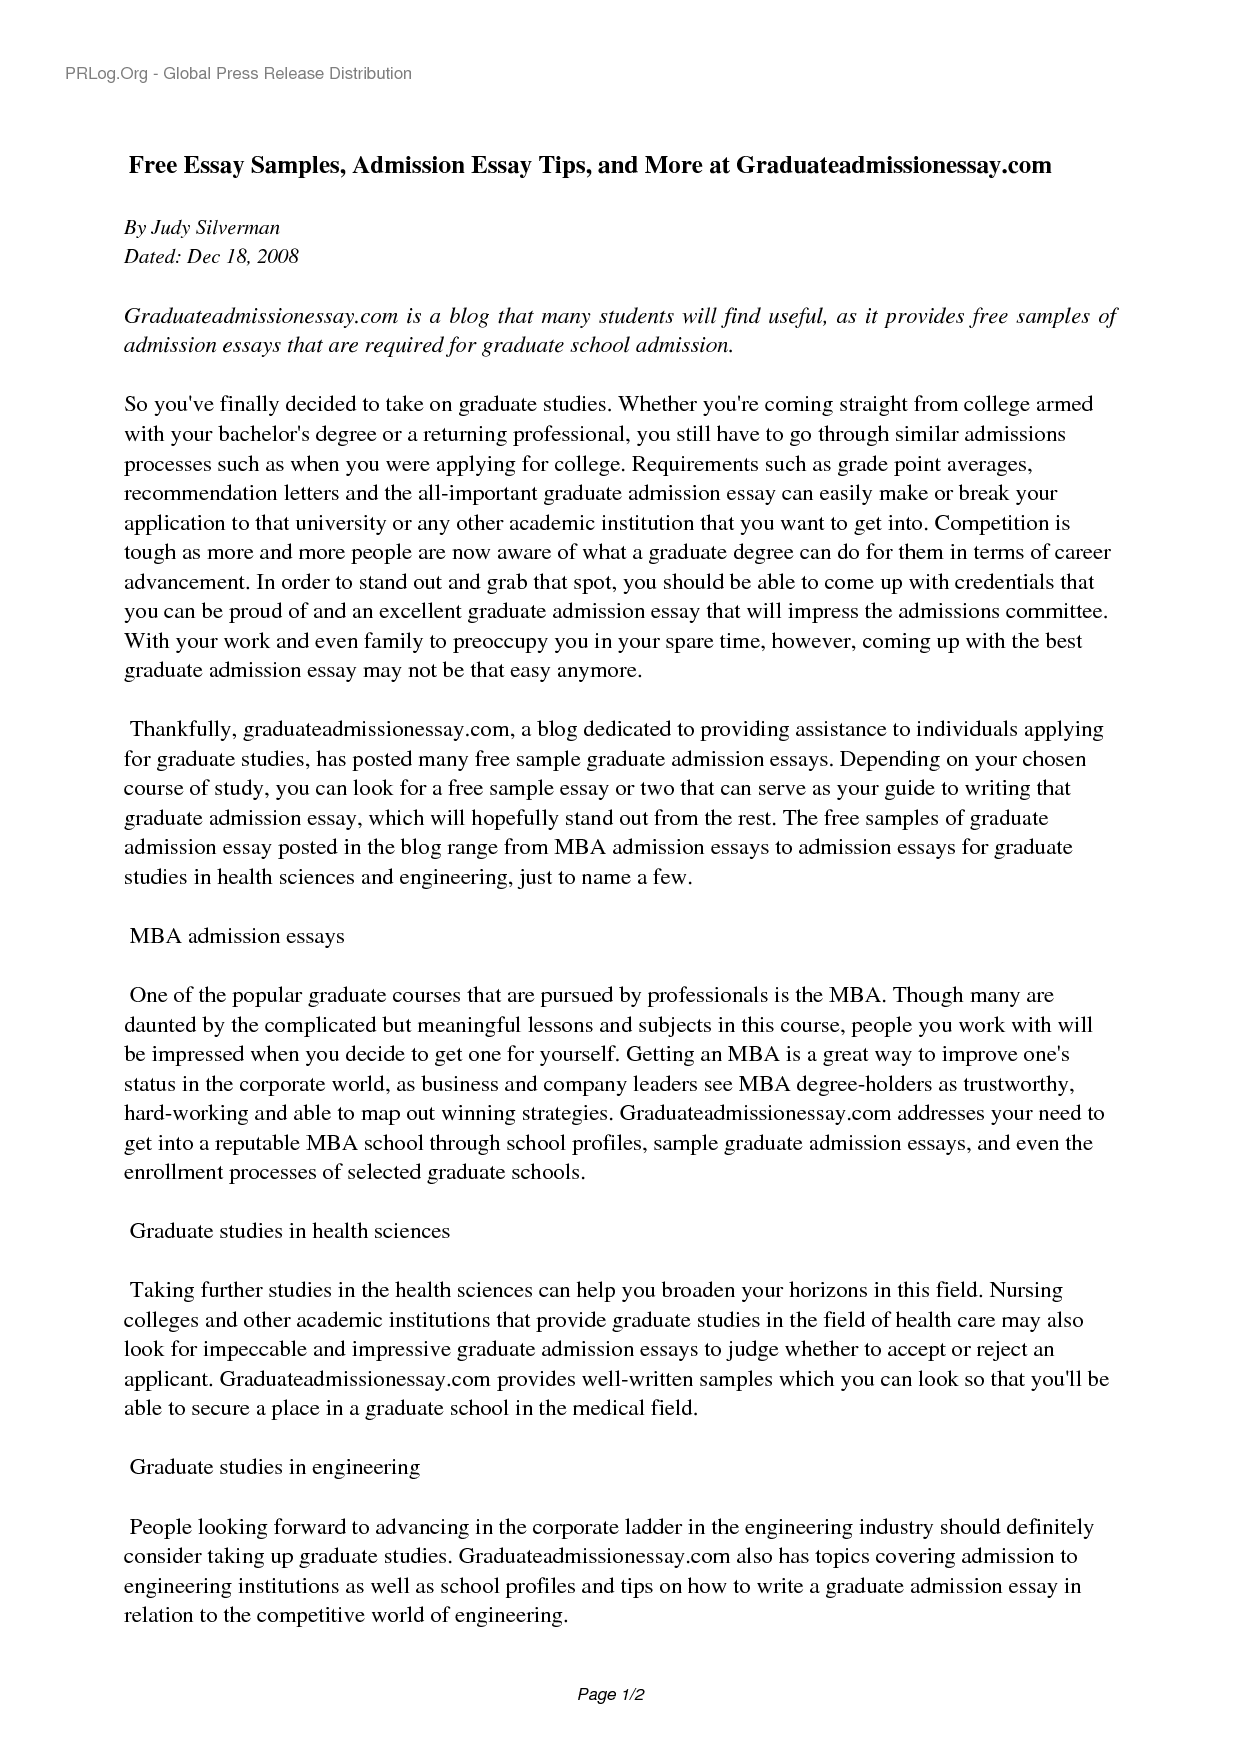 002 Essay Example Student Resume Internship Graduate School Template Motivational Letter Postgraduate Studies Solutions Grad Application Examples Cover Cute Applying Motivation Frightening Admission Social Work Nursing Samples Full